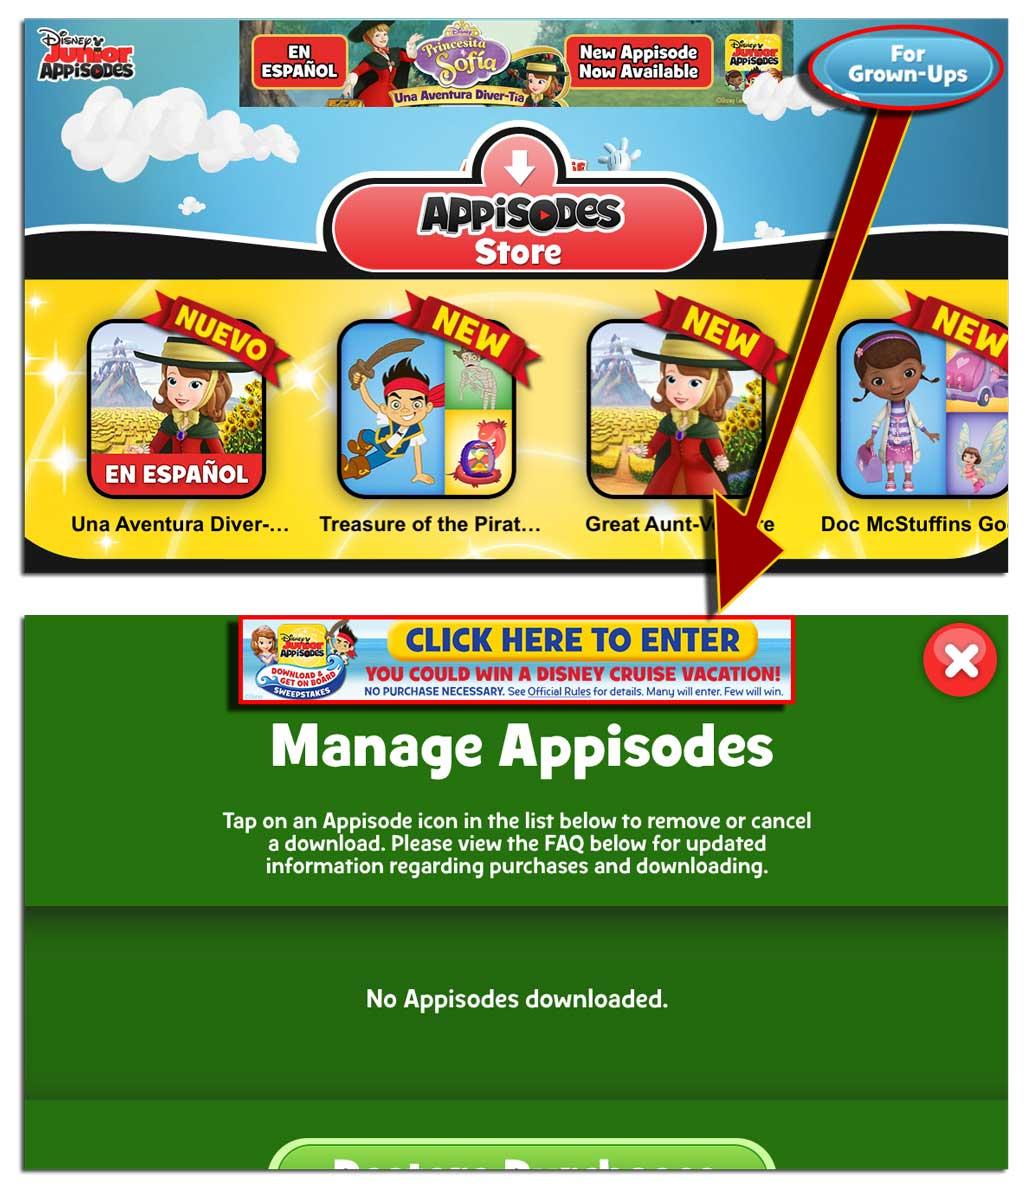 Disney appisodes wont download